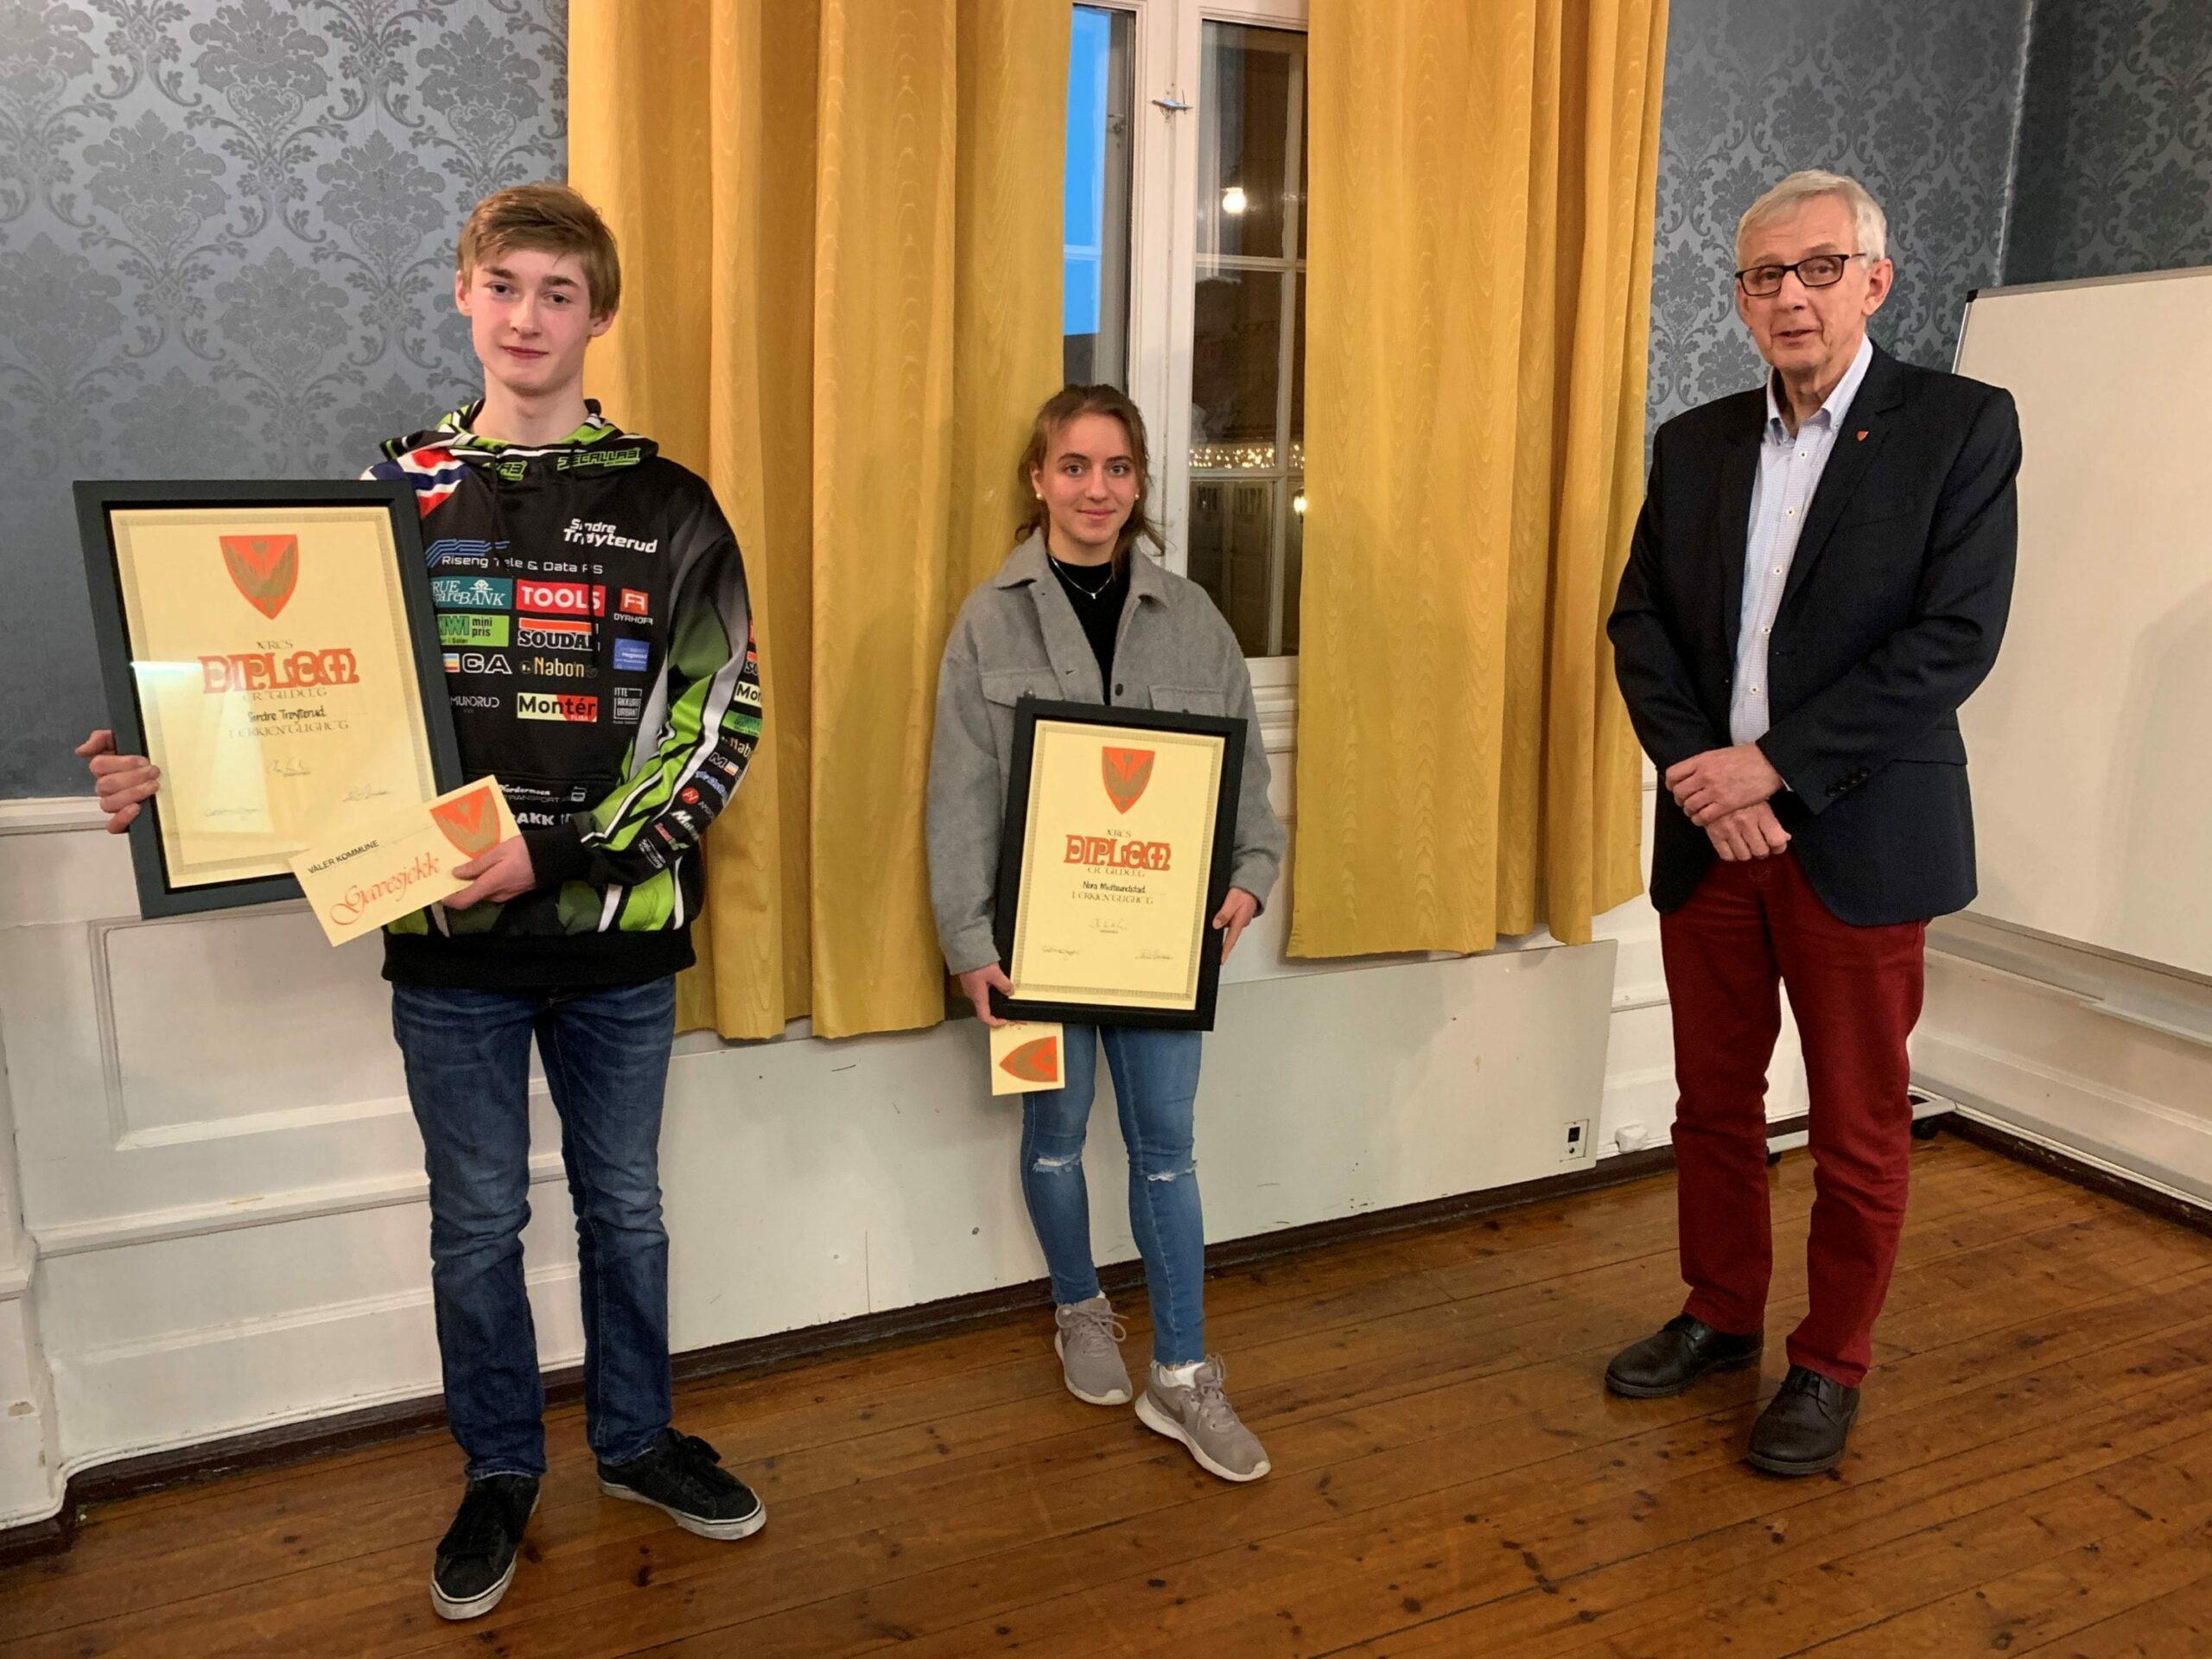 BLE HEDRET: Sindre Trøyterud (16) og Nora Midtsundstad (17) ble tildelt Våler kommunes ungdomspris mandag kveld. Ordfører Ola Cato Lie er glad for å kunne tildele prisen til to meget verdige vinnere.